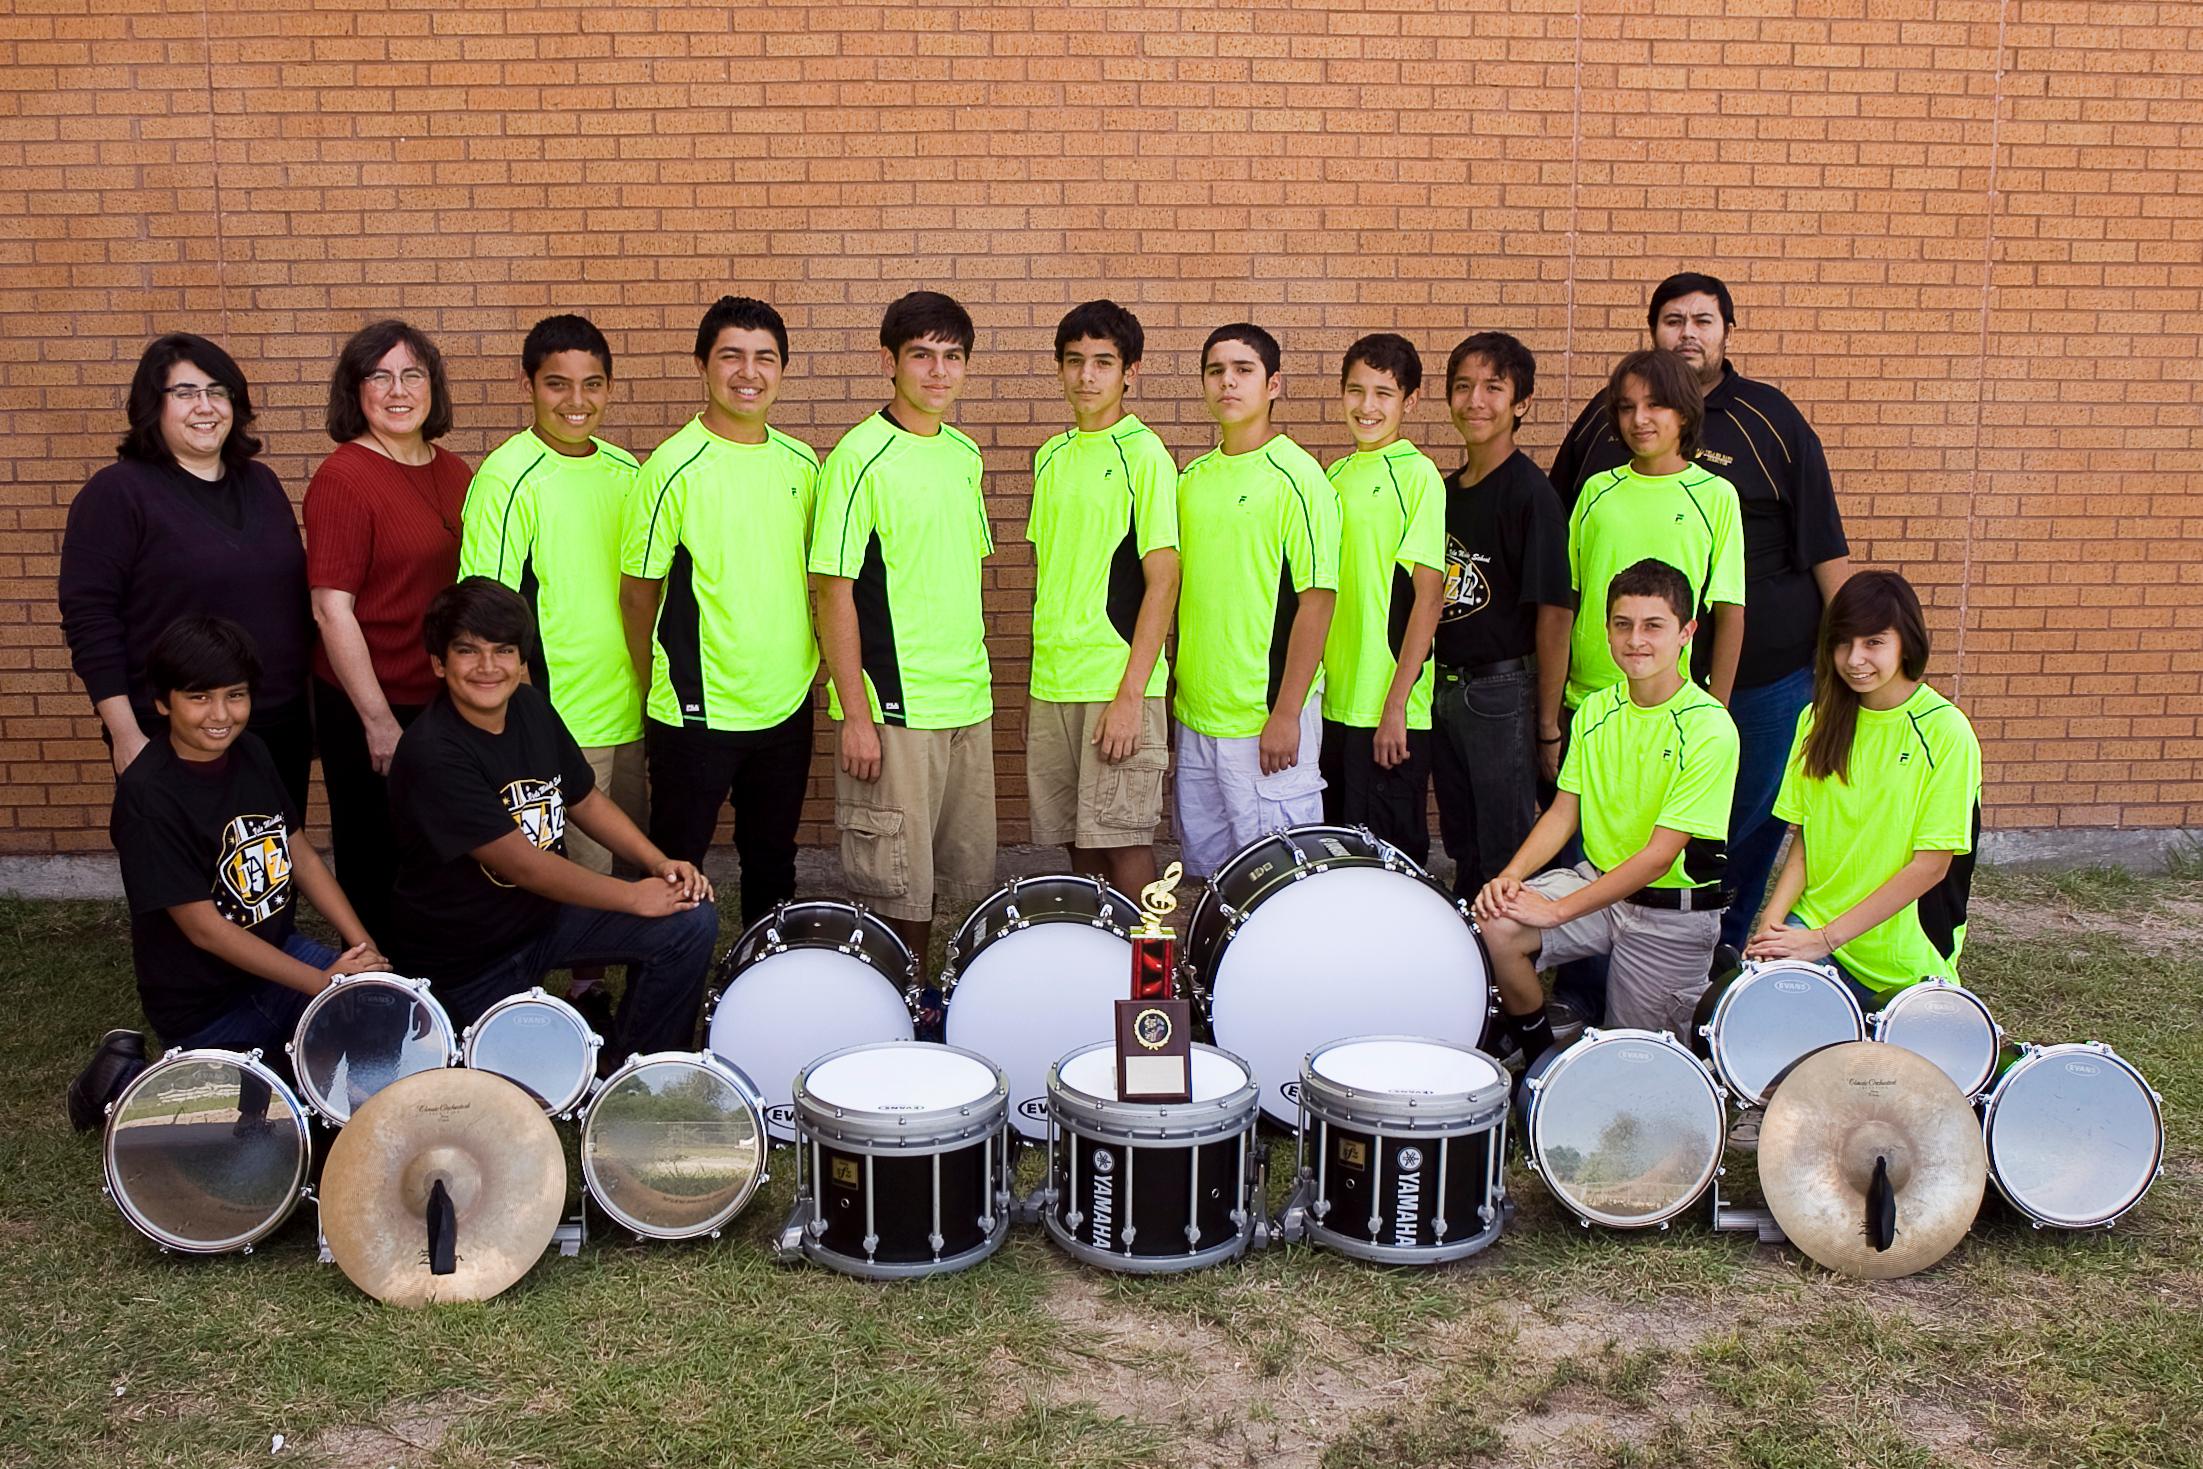 Vela Drumline Champions